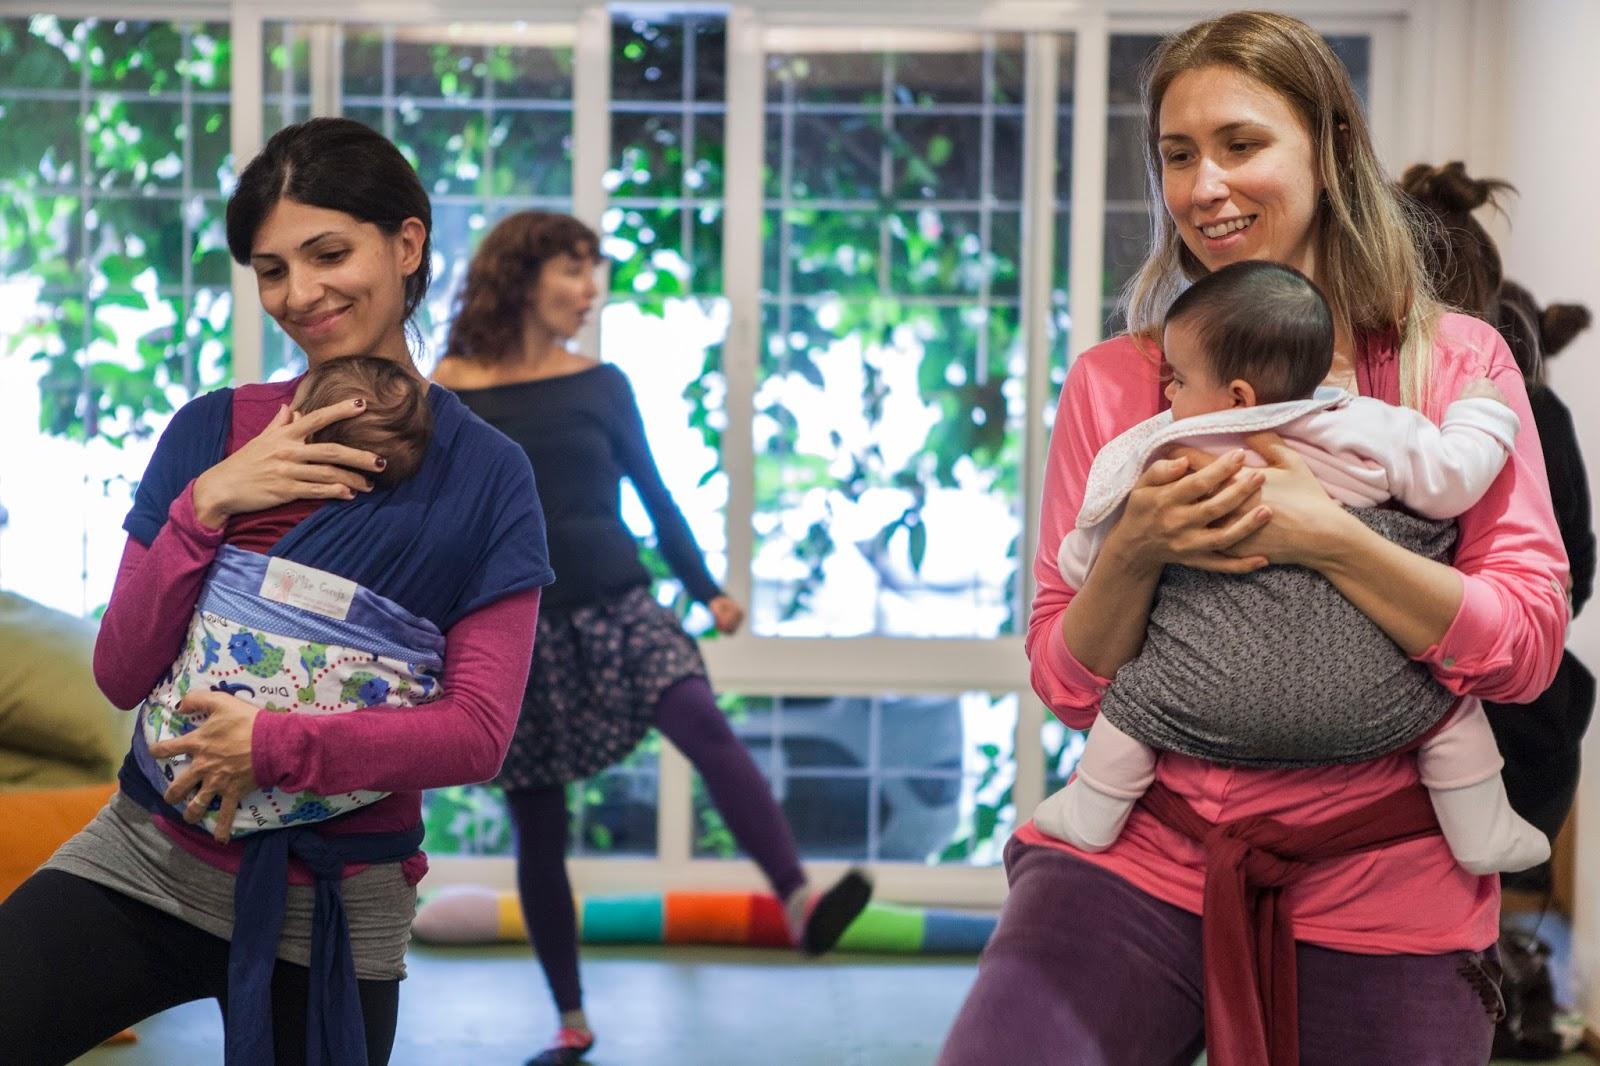 Activities for babies: maternal dance